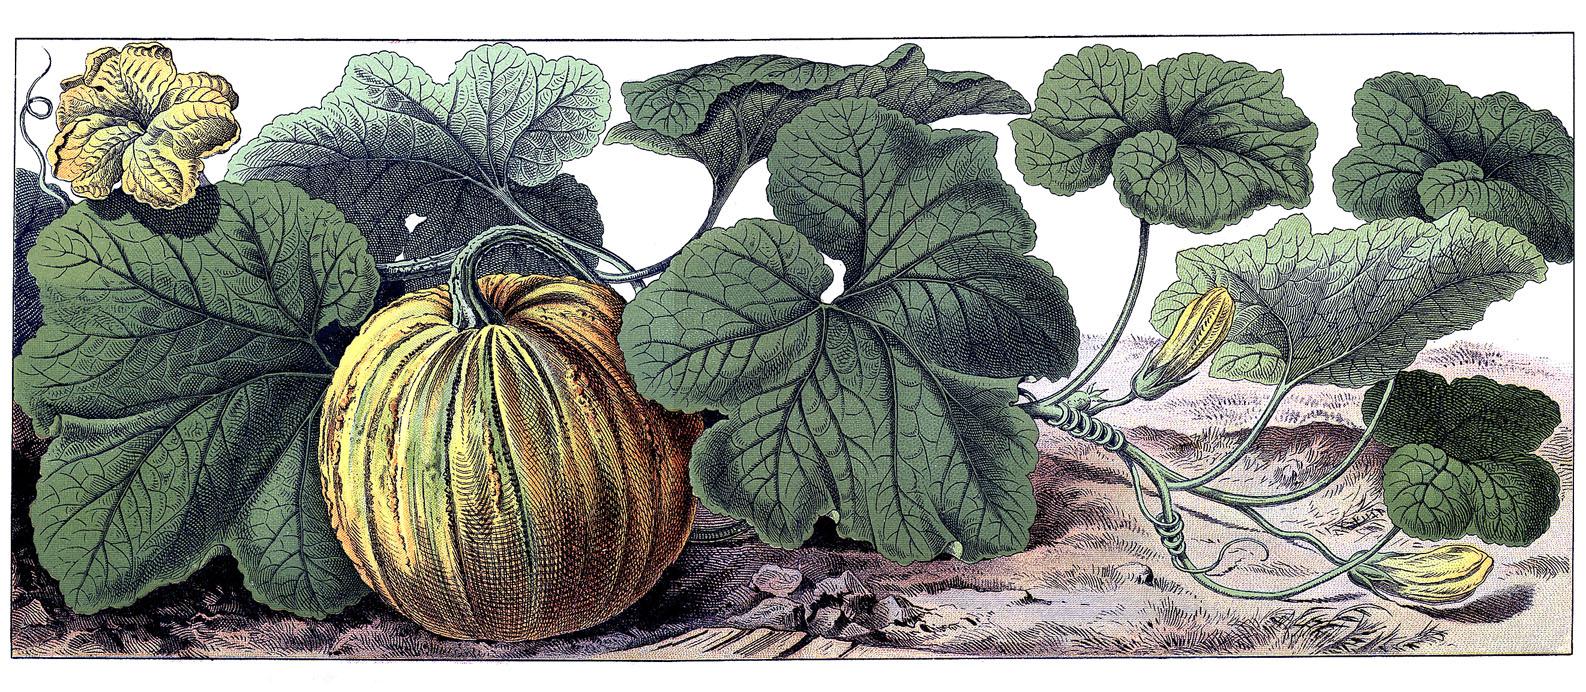 Vintage Halloween Graphic - Botanical Pumpkin - The ...